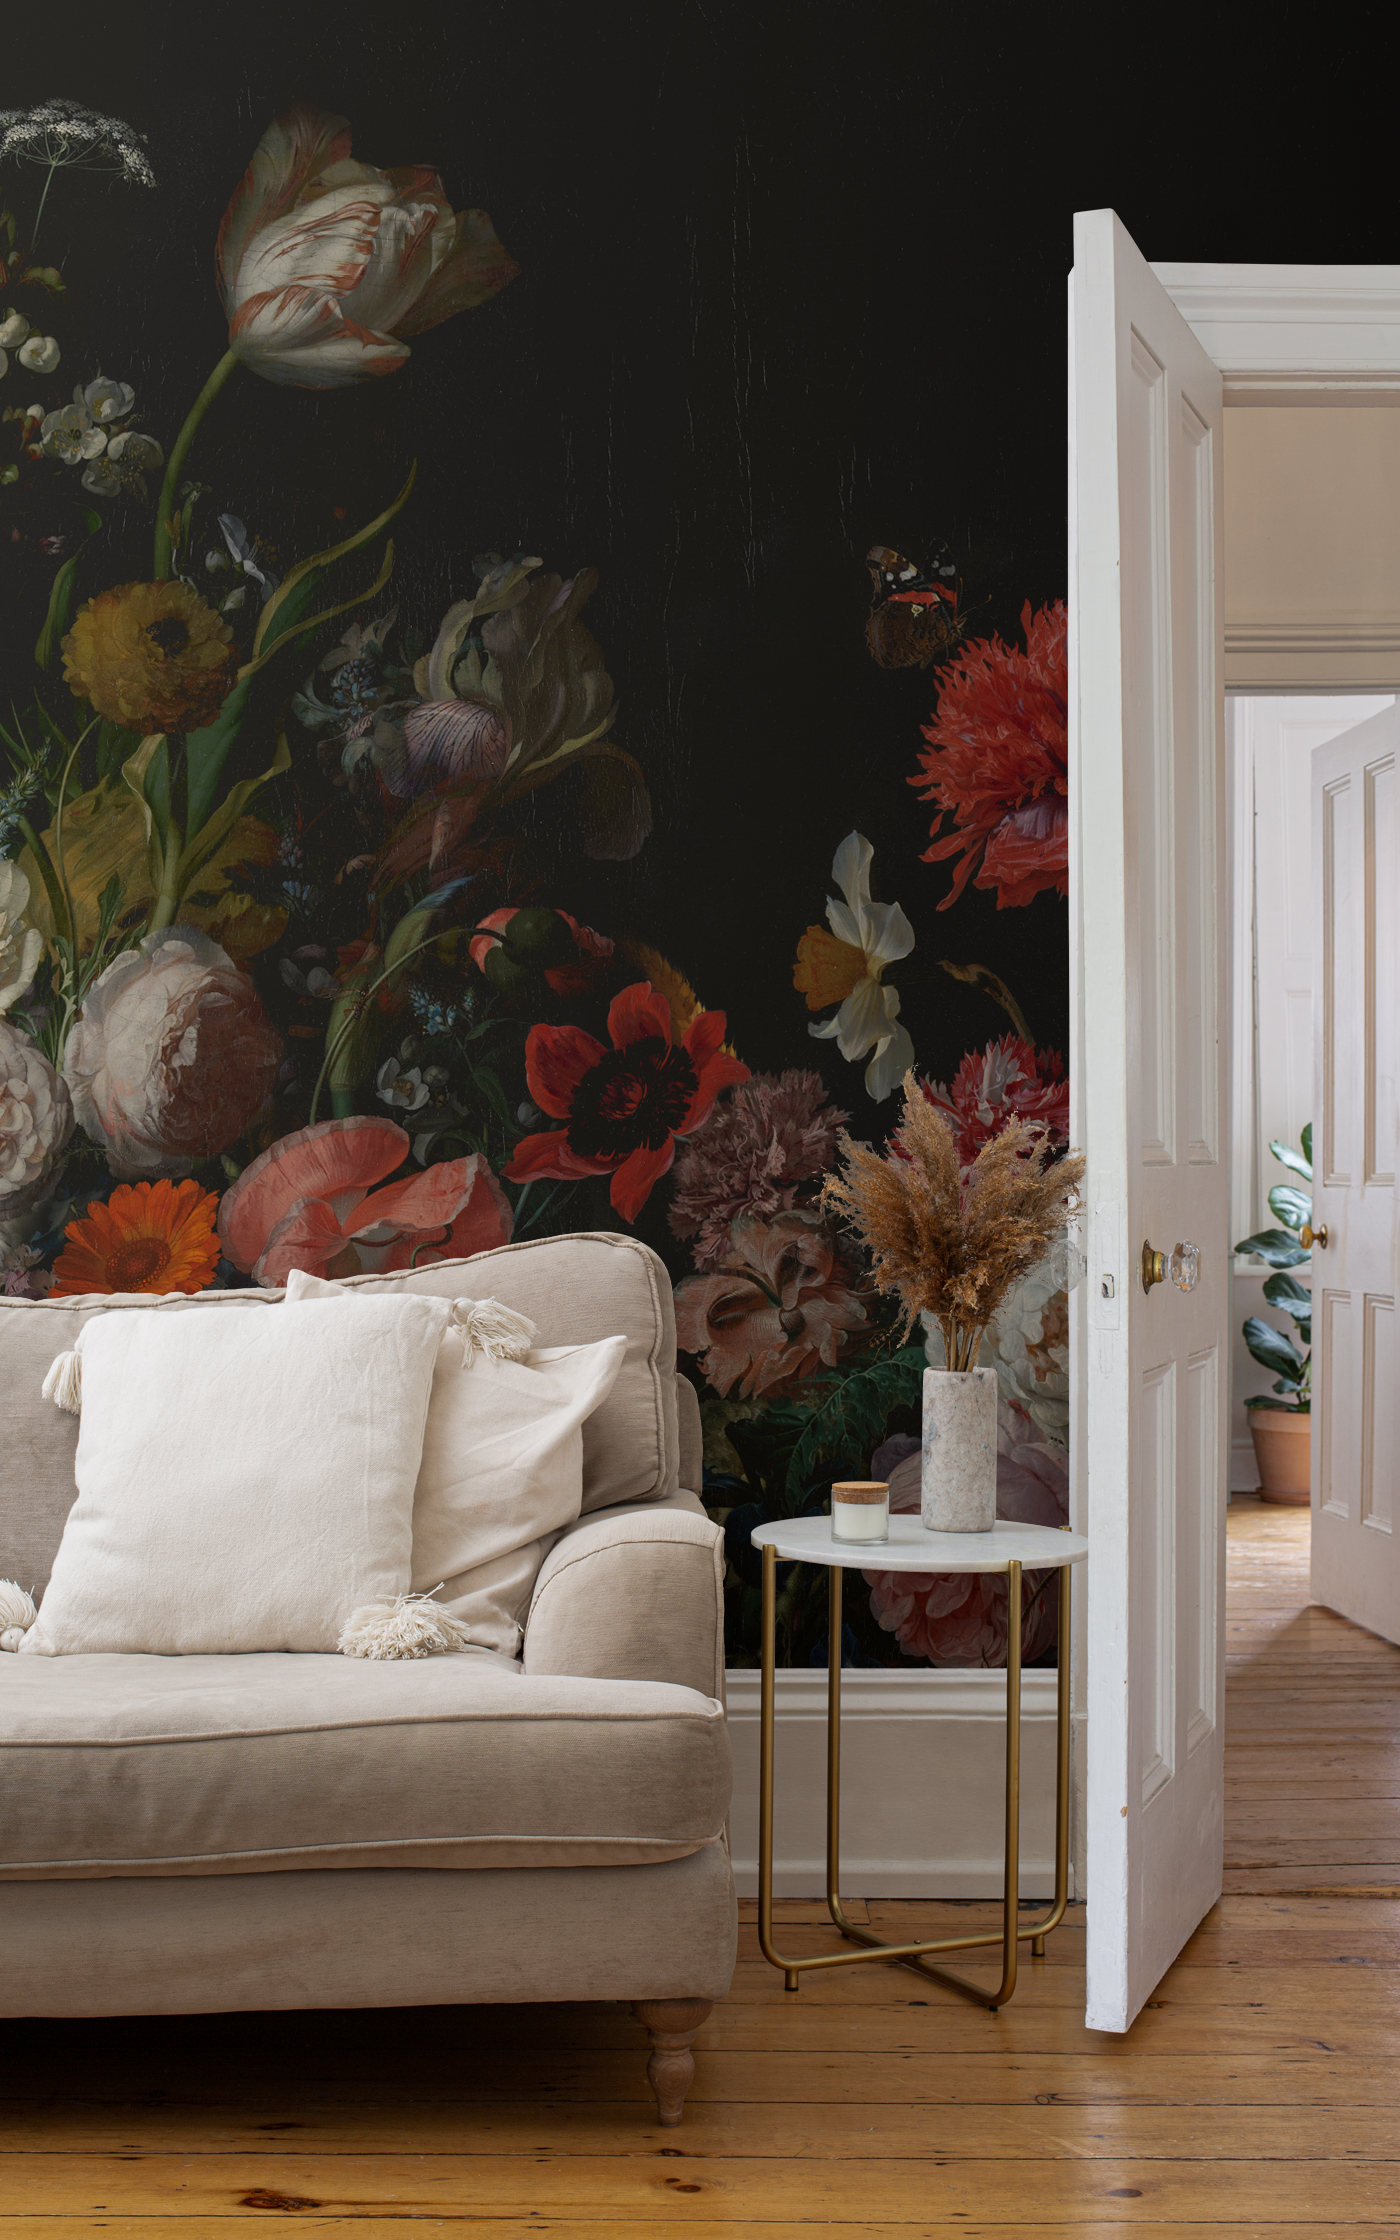 Cornelia dark floral mural in living room